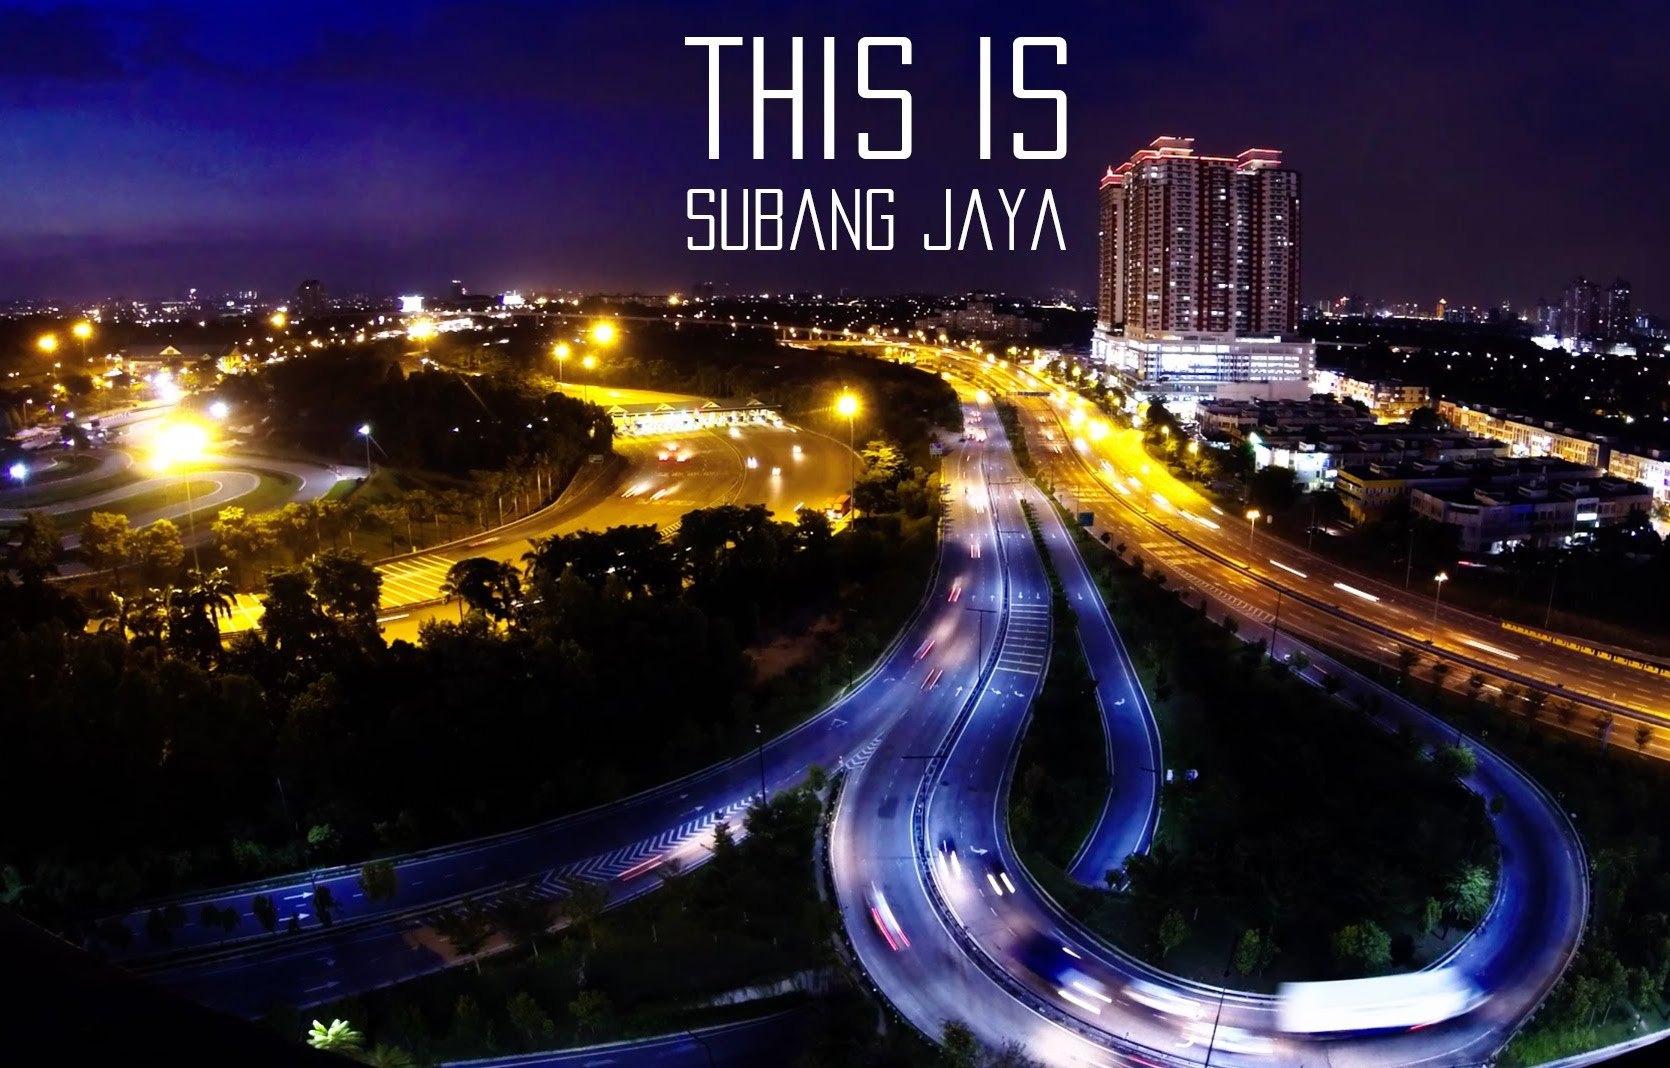 House for sales top 40 properties subang jaya